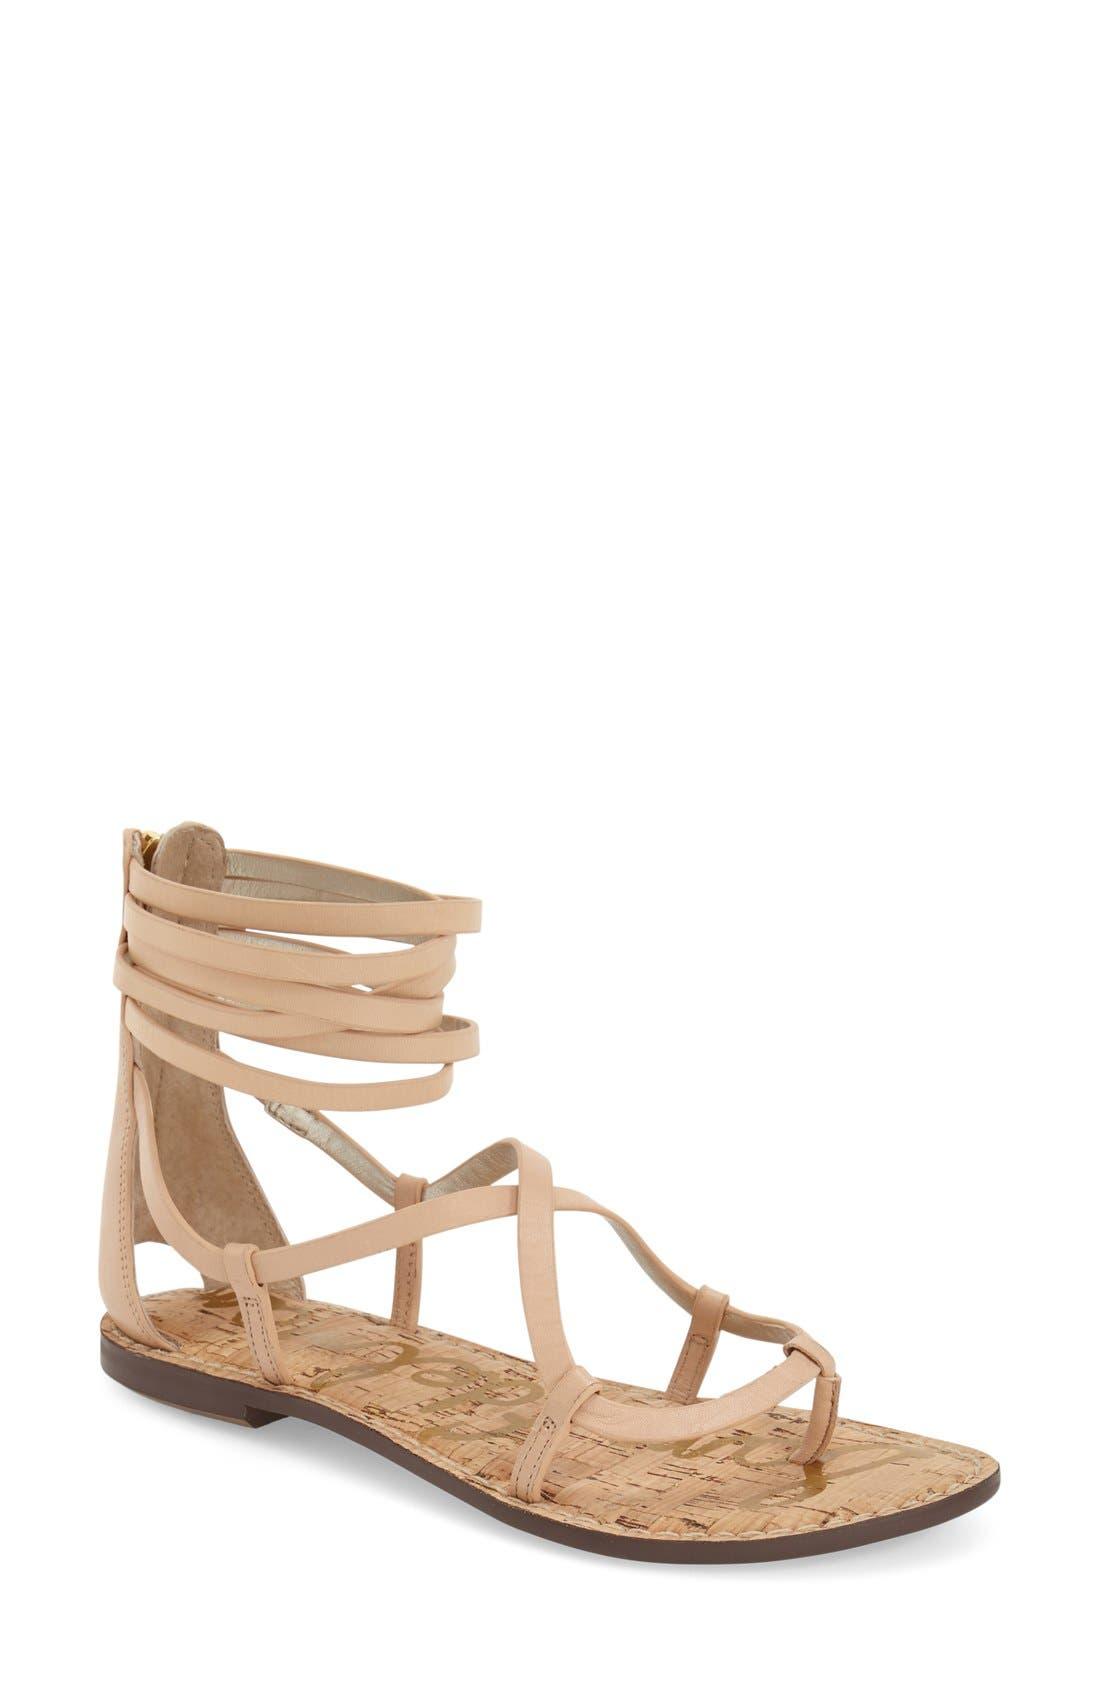 'Ginette' Sandal,                             Main thumbnail 1, color,                             Natural Naked Leather